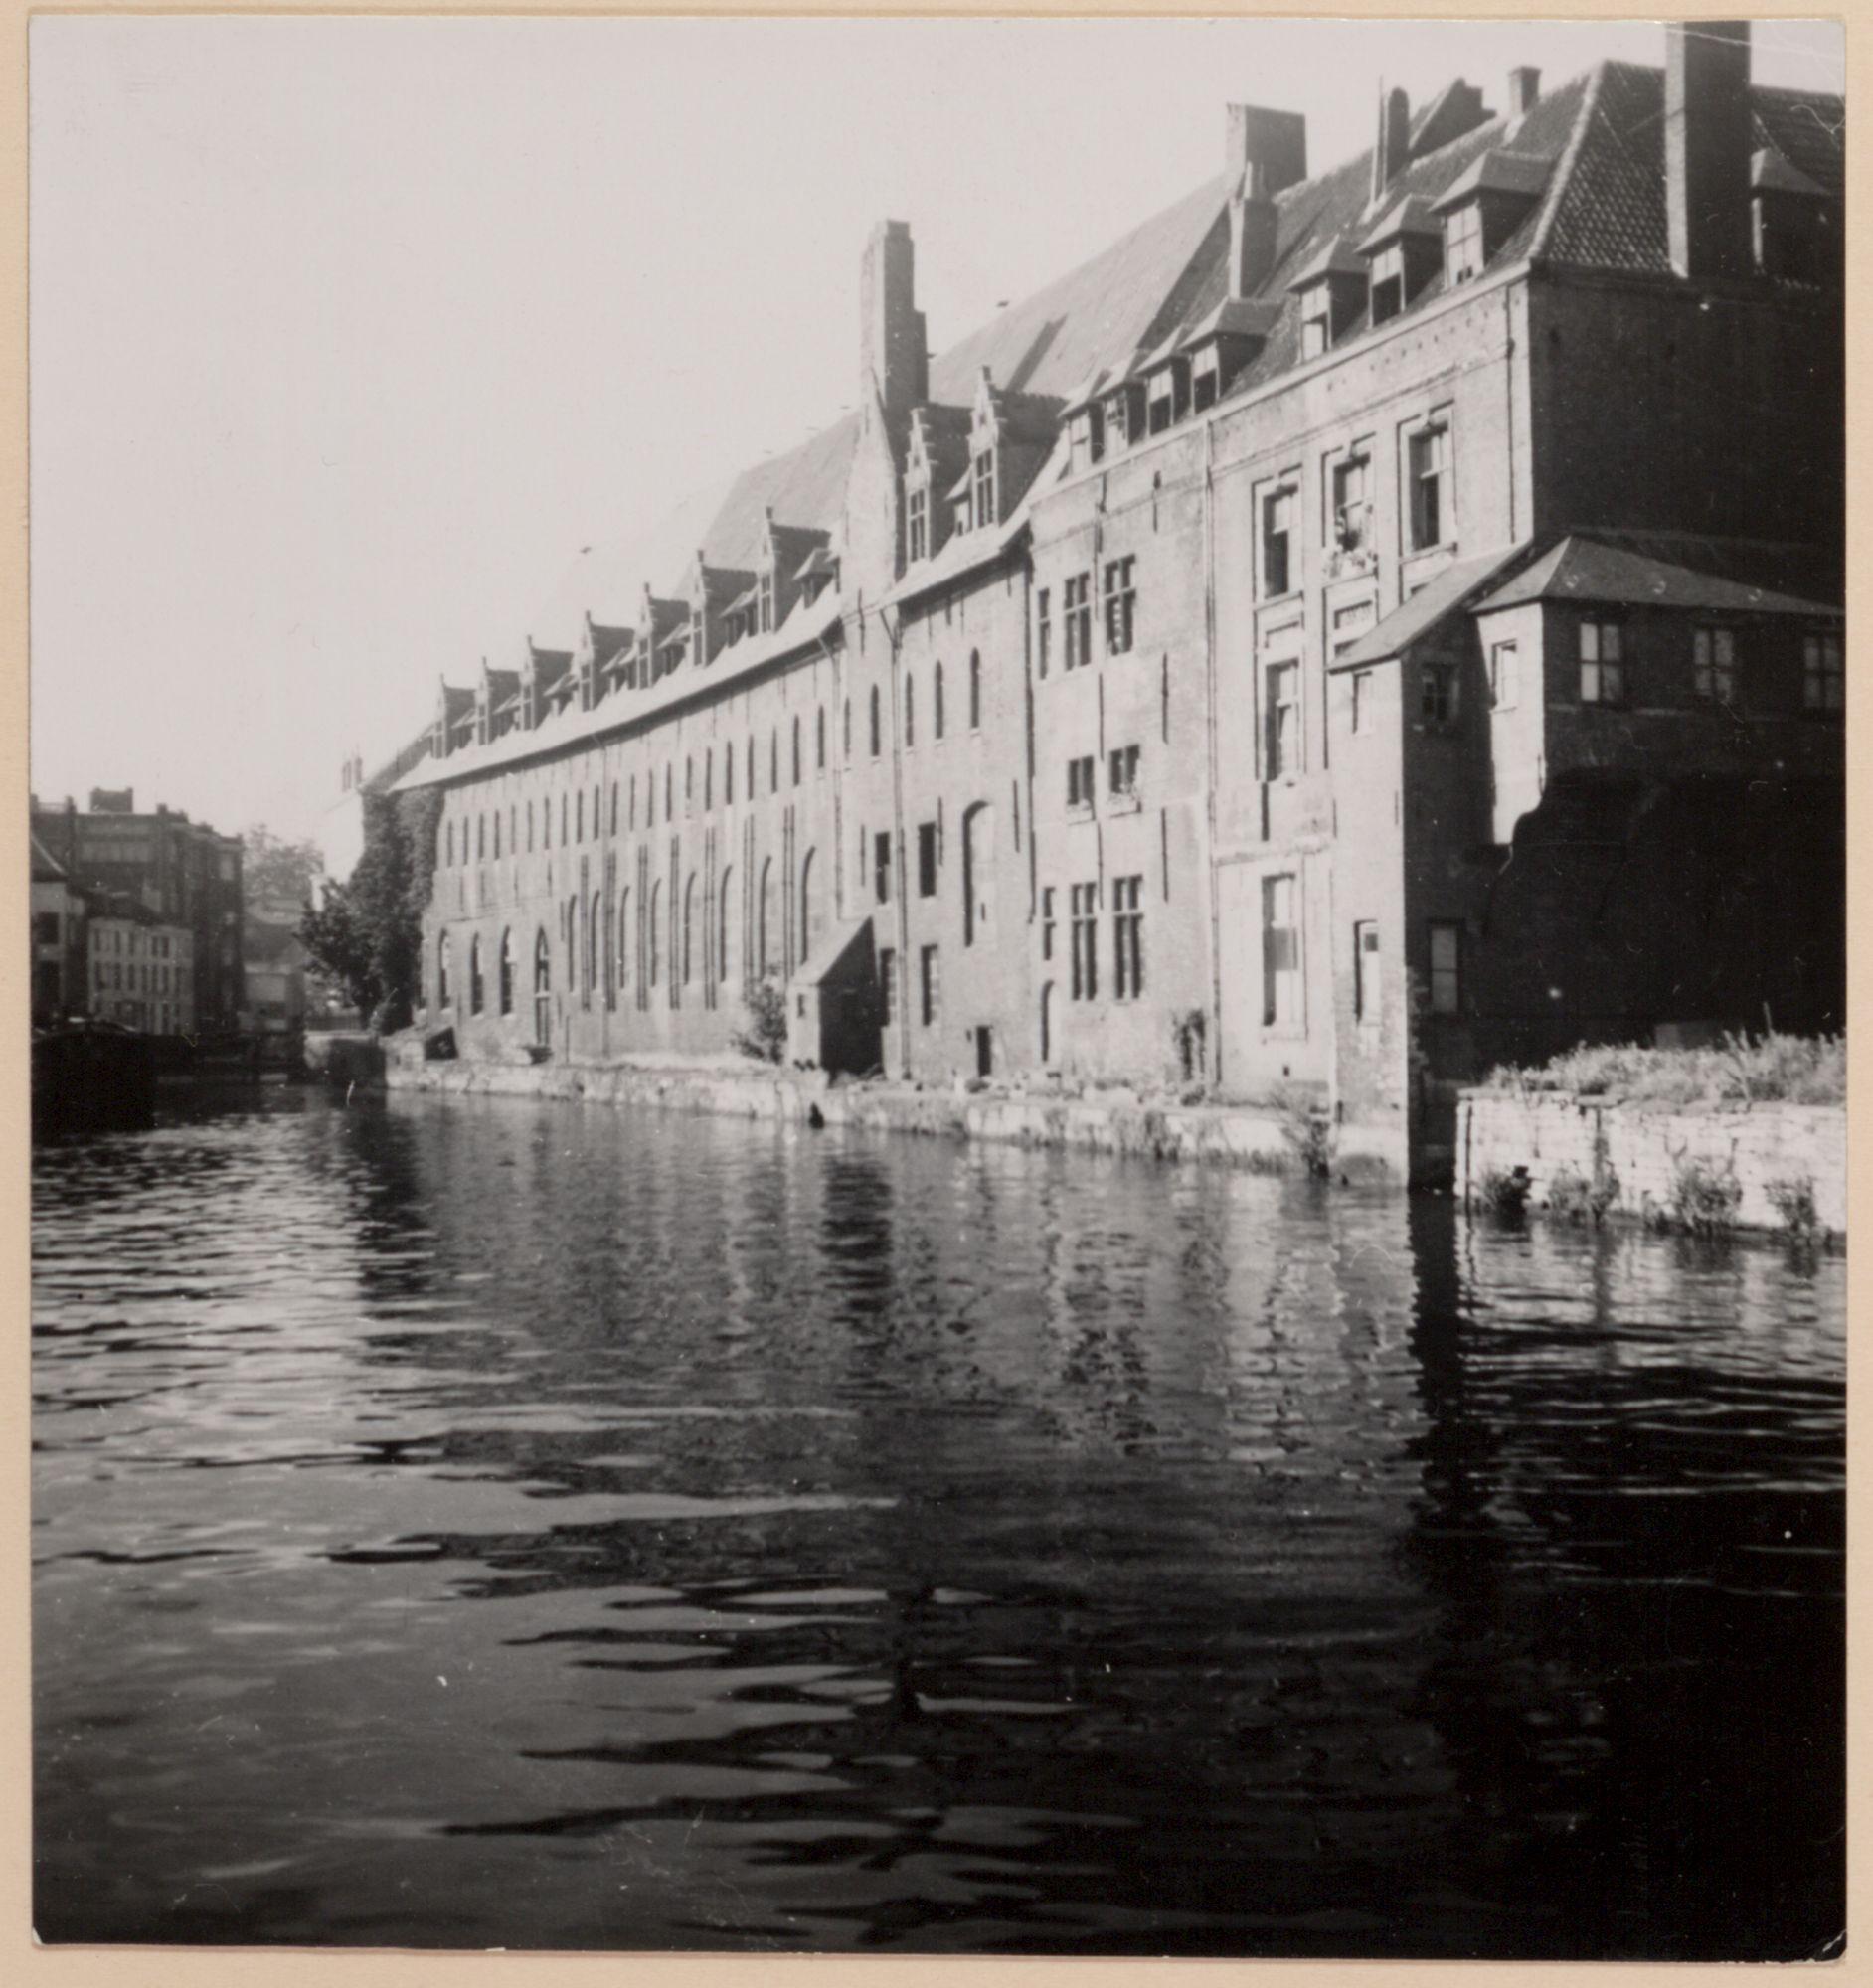 Gent: Dominicanenklooster, Predikherenlei